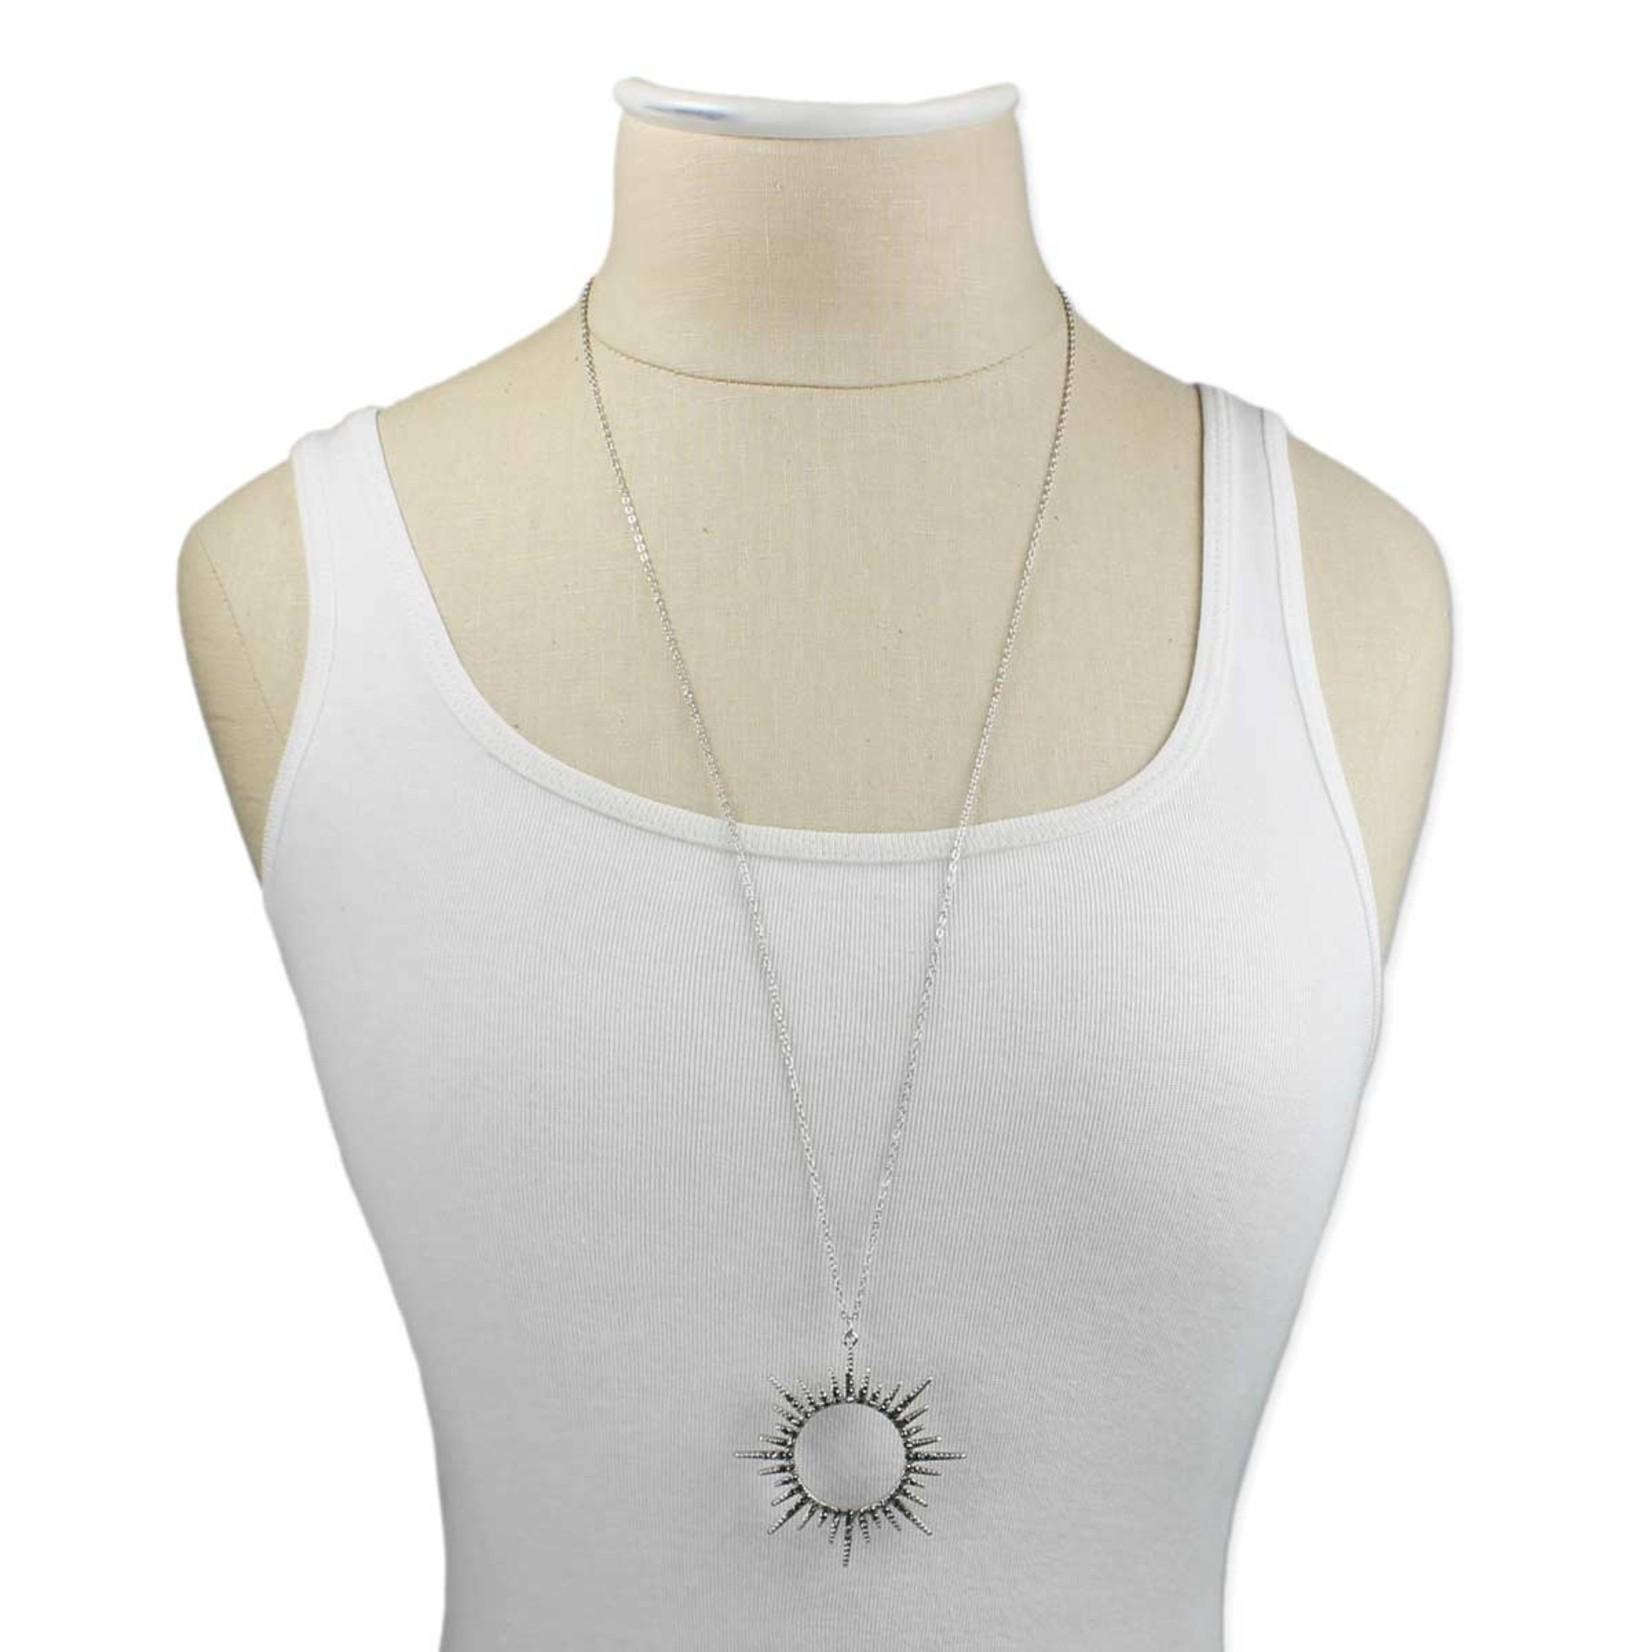 Necklace - Silver Sunburst Crystal